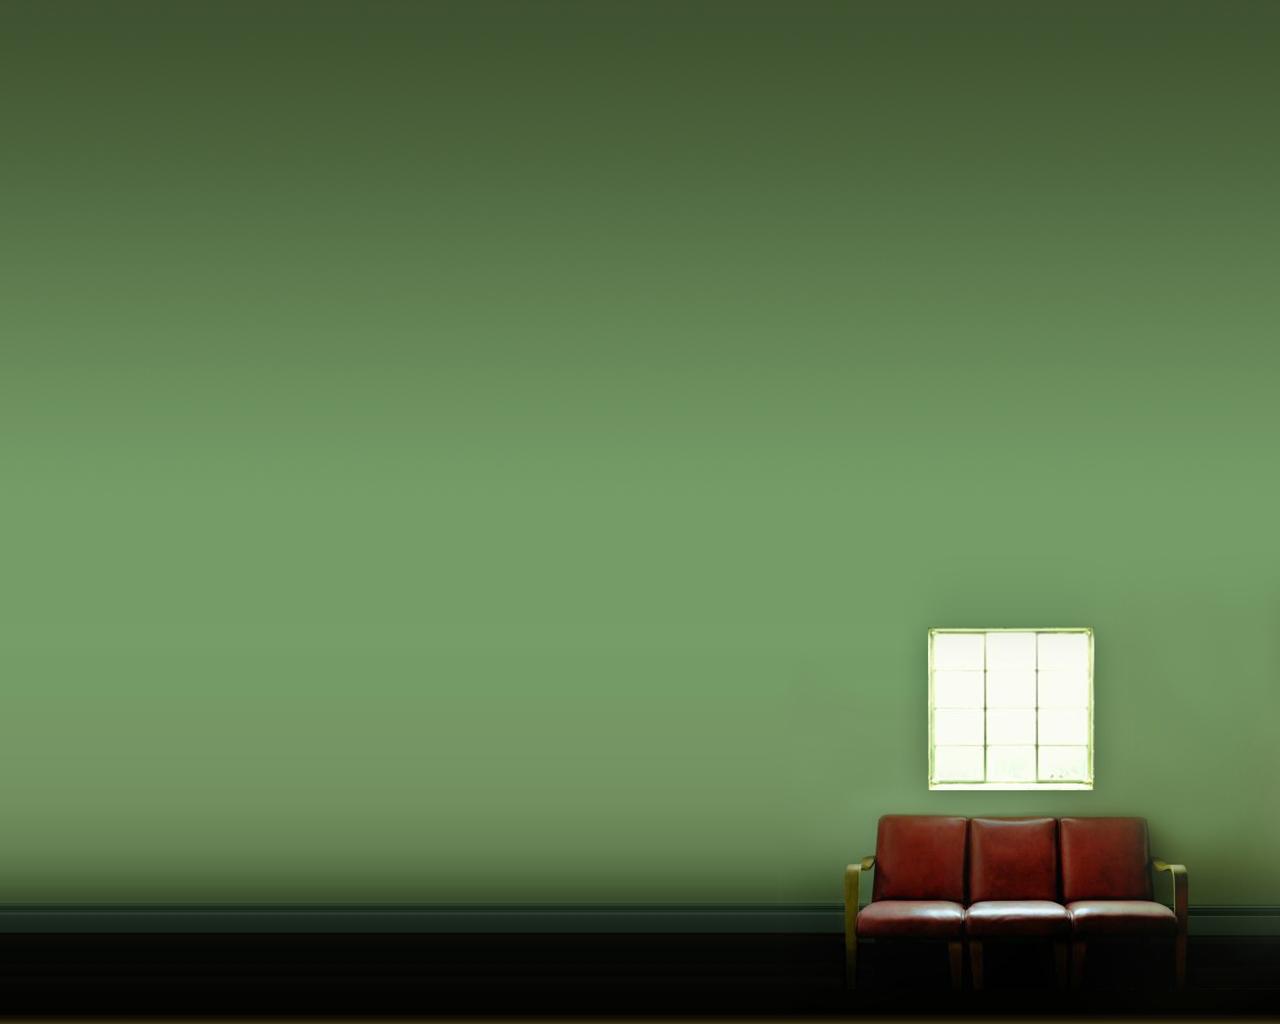 Green Room Design Amsterdam